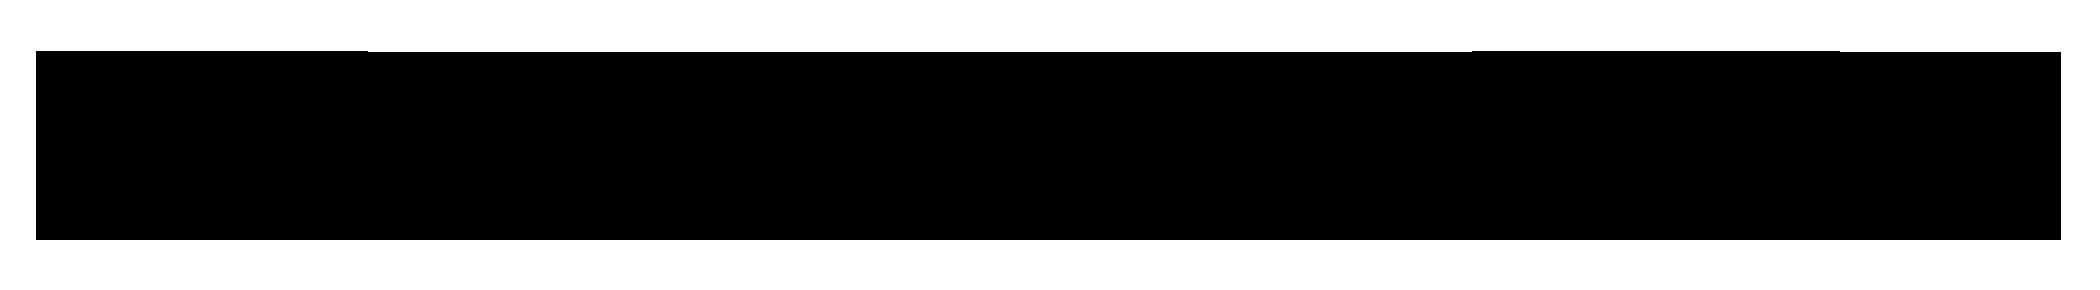 Apollospace Logo